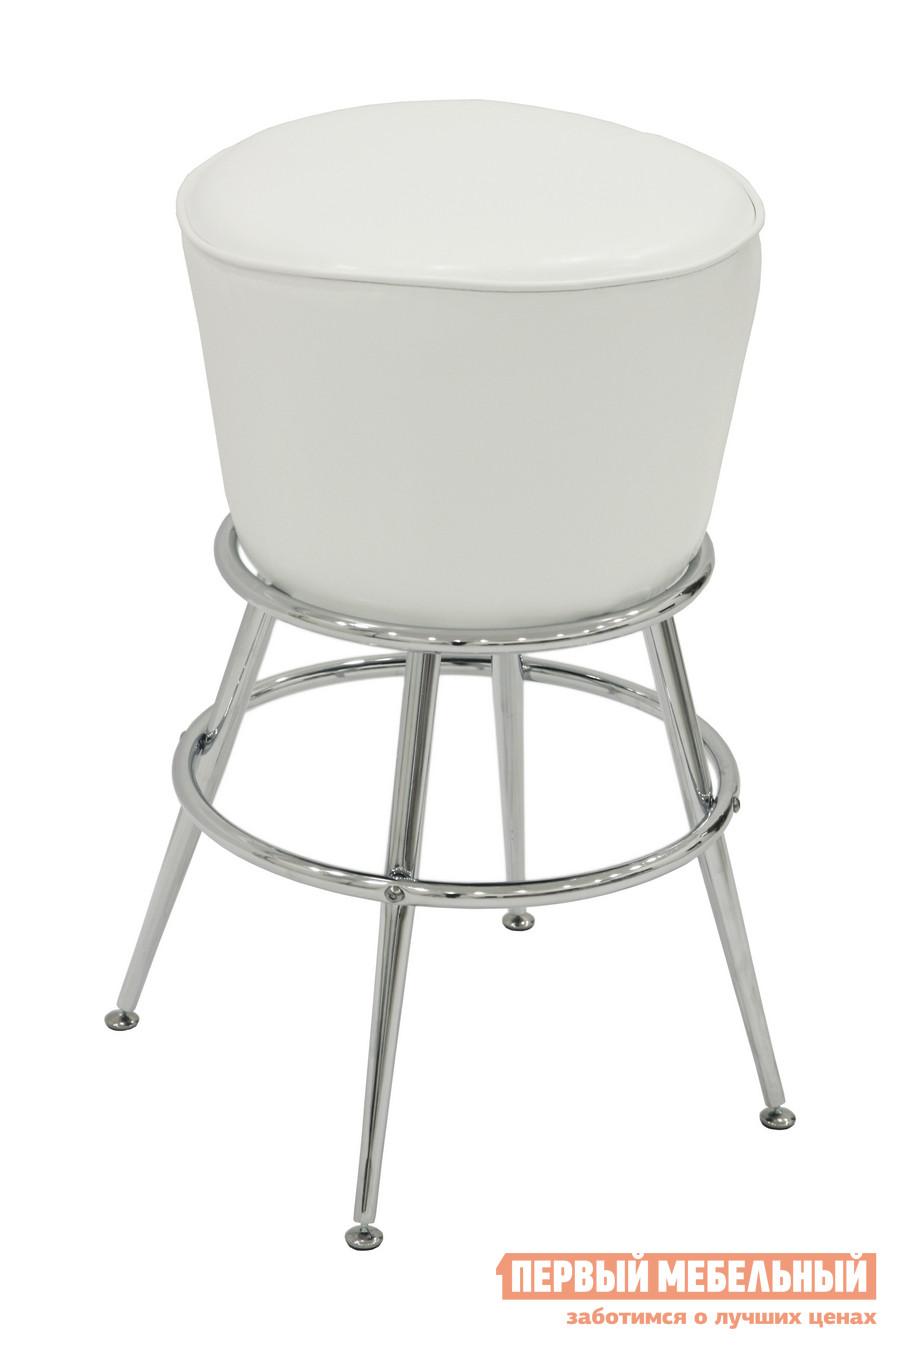 Барный стул Бентли Трейд JY-6016 SHINY WHITE